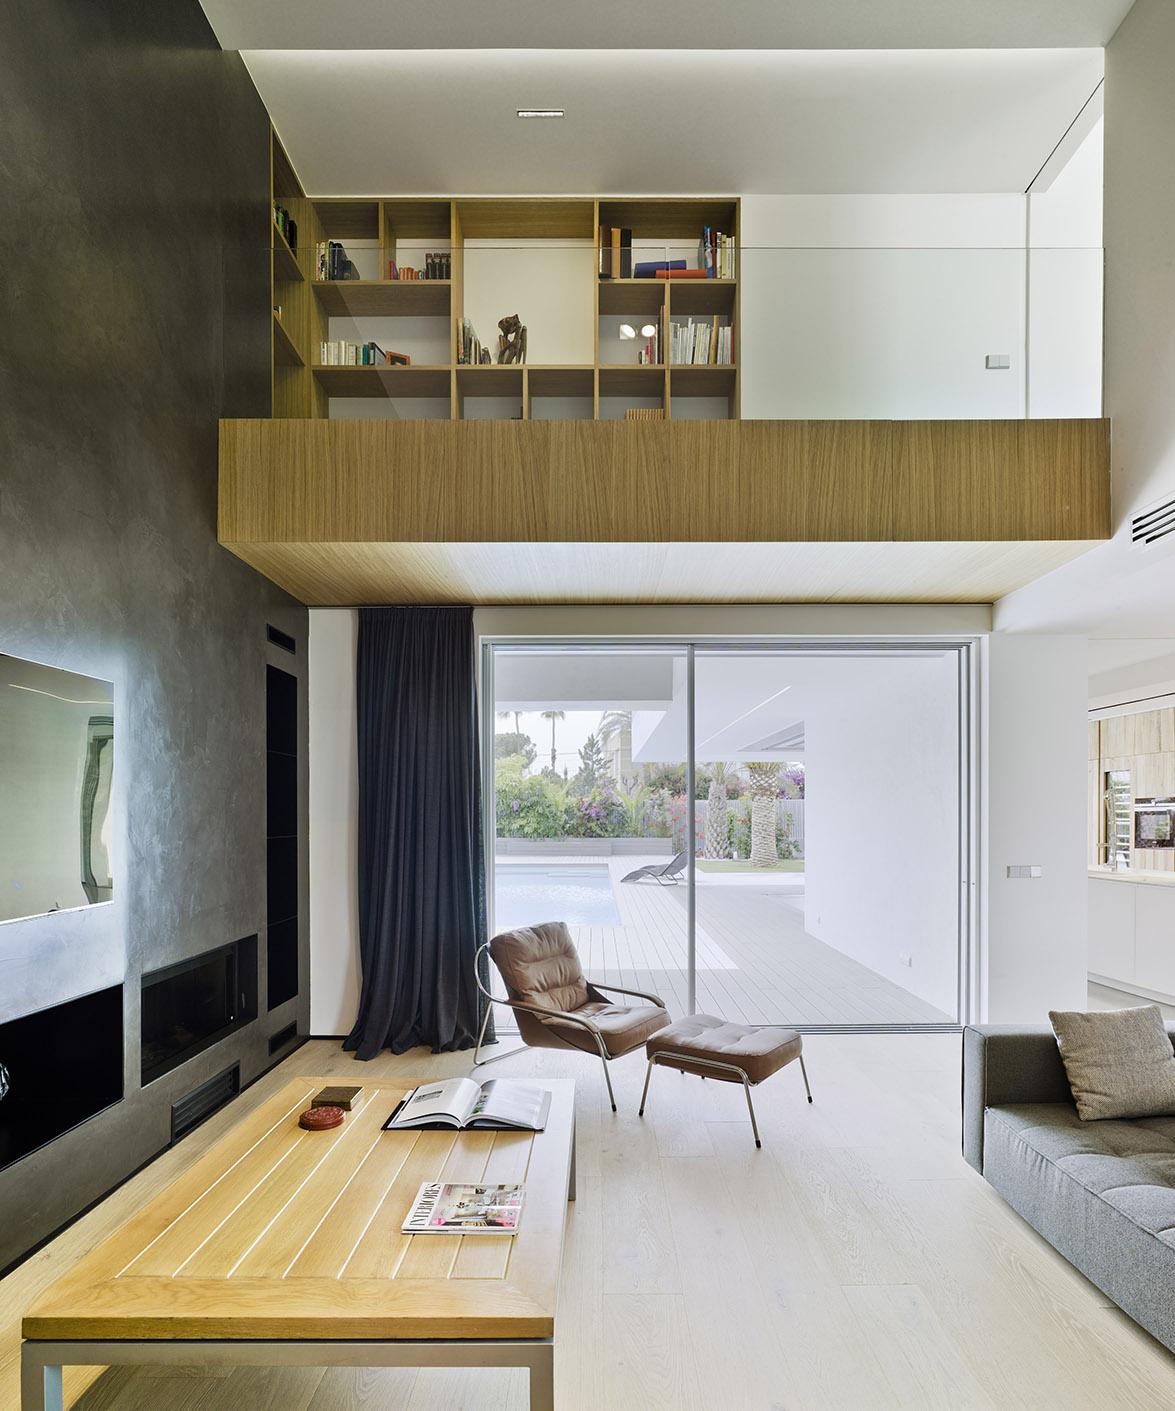 Villa z v de tom s amat estudio de arquitectura - Estudios arquitectura alicante ...